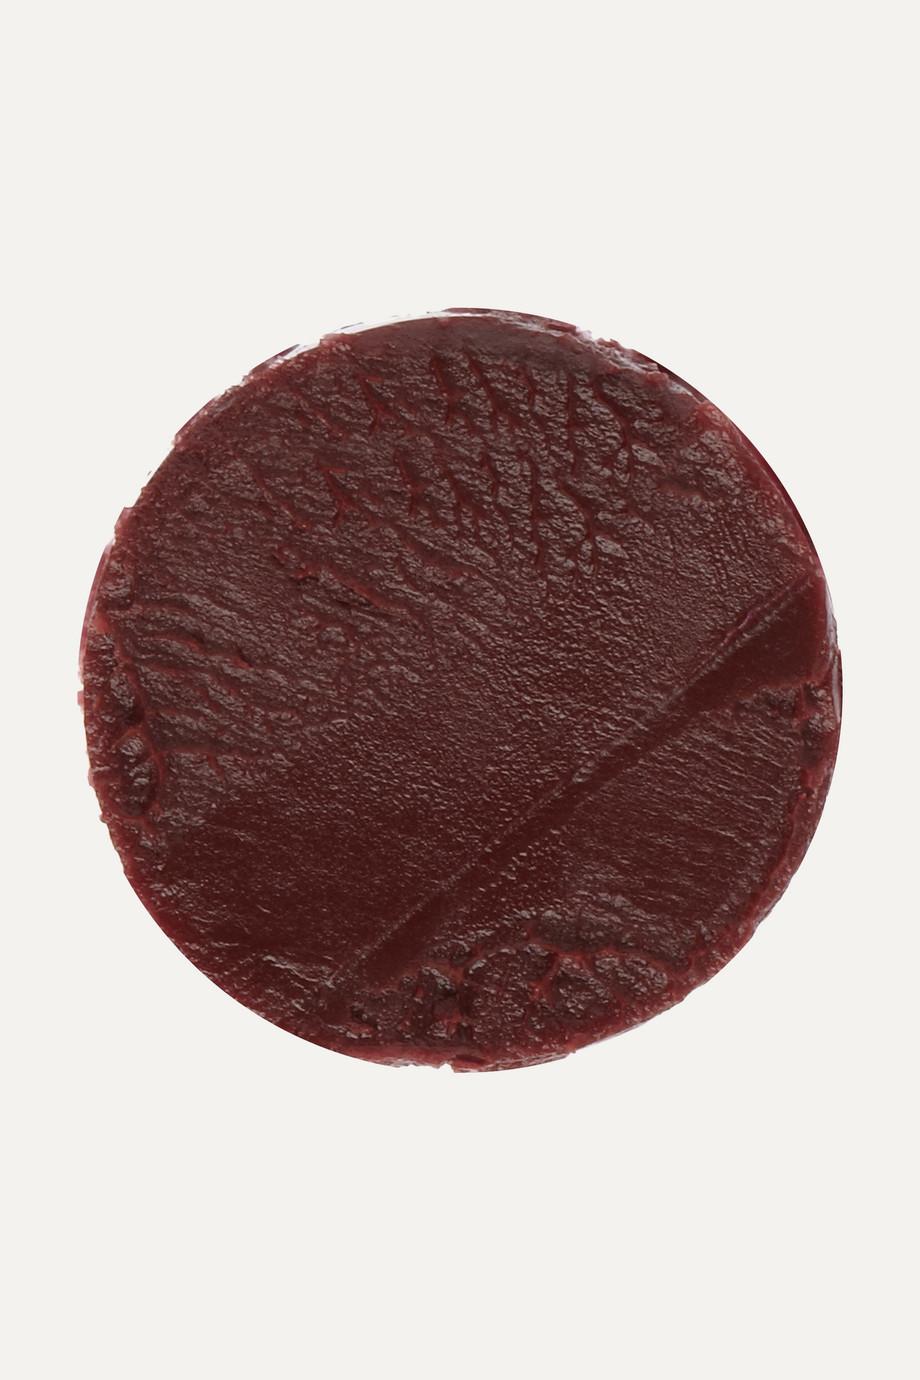 Elizabeth Arden Eight Hour® Cream Lip Protectant Stick Sheer Tint SPF15 - Plum